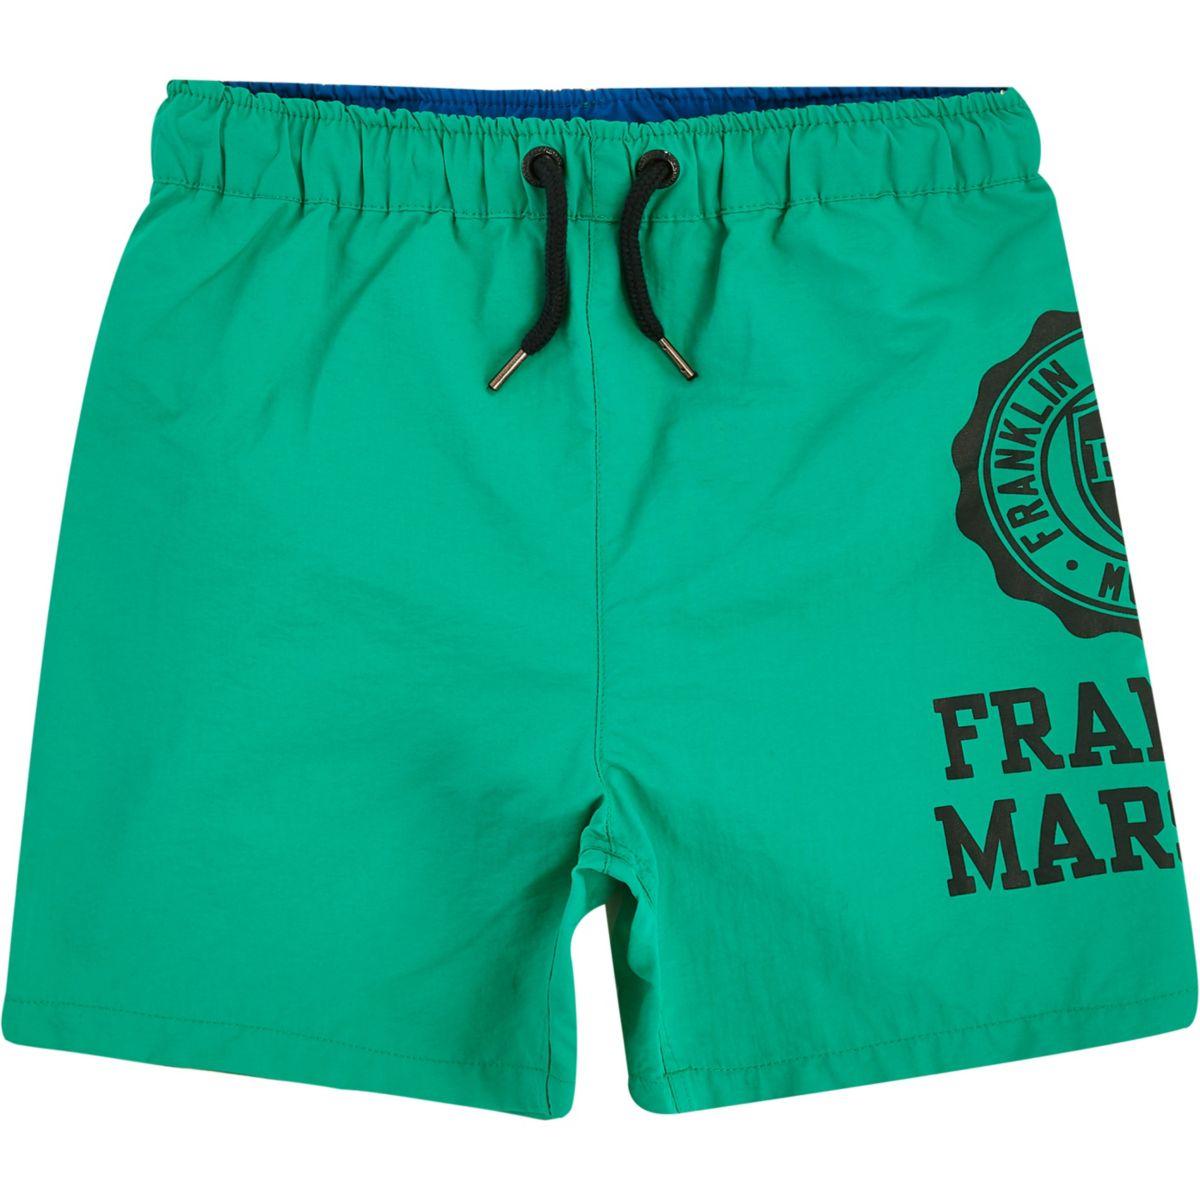 Boys green Franklin & Marshall swim shorts